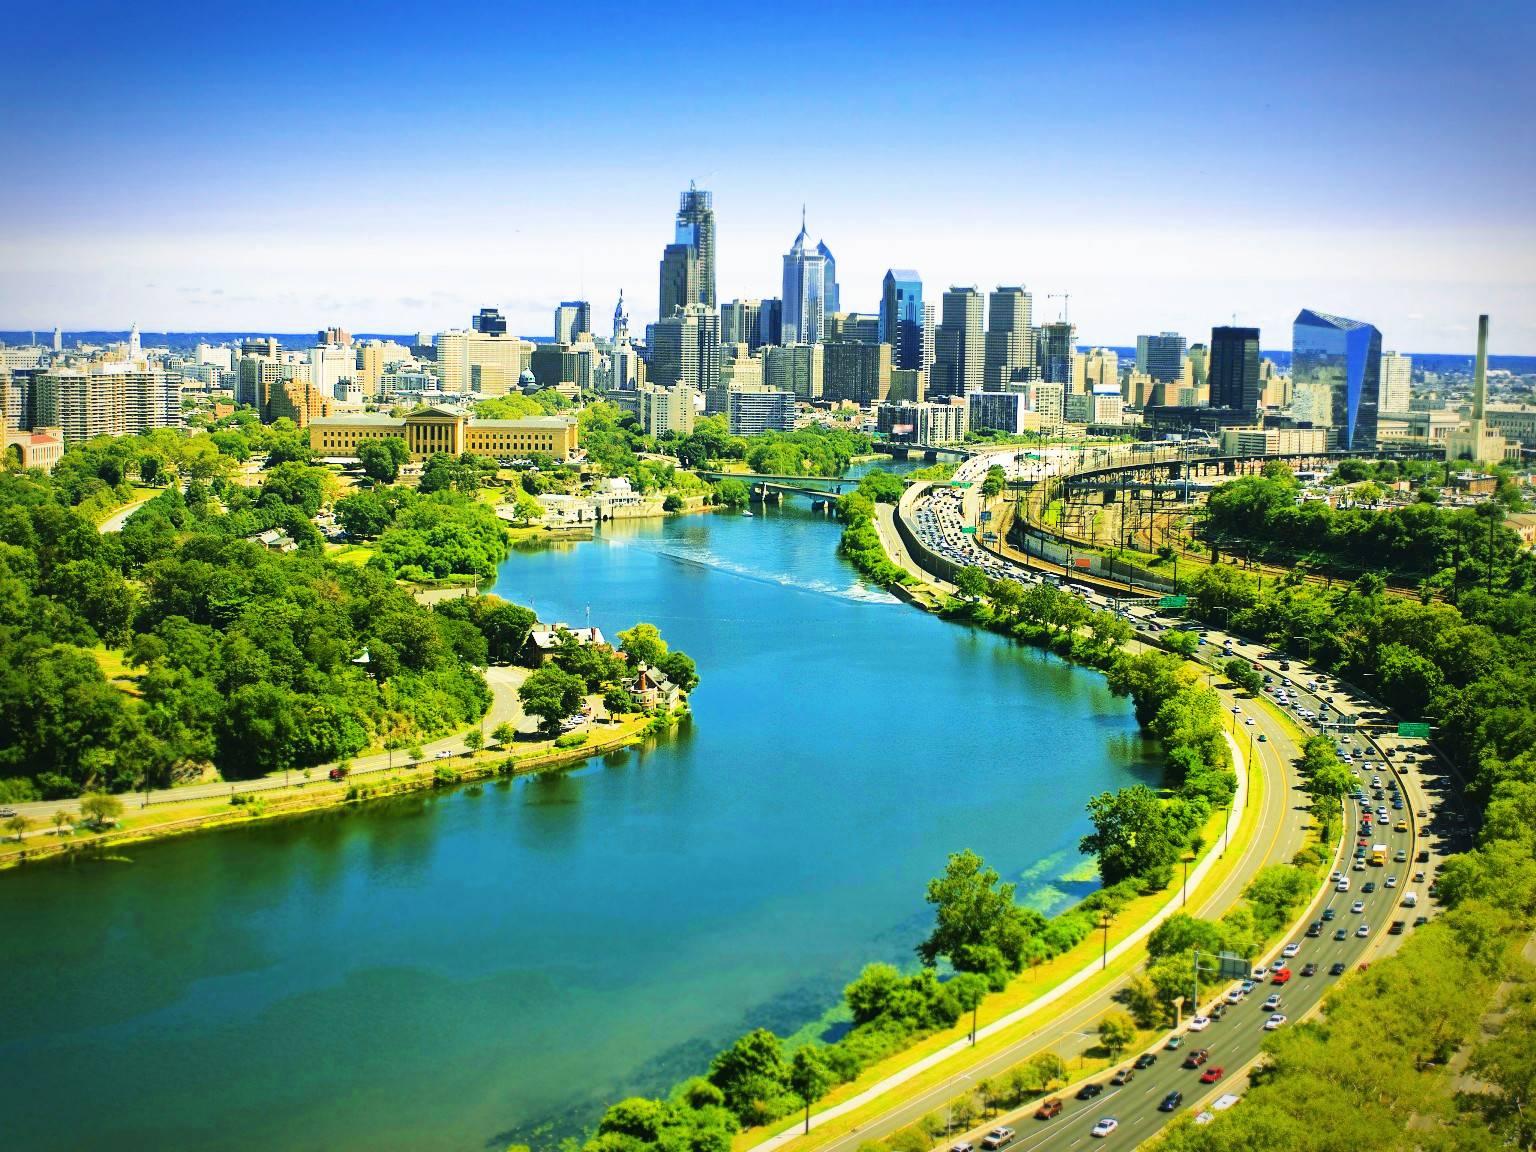 8-Day East Coast Bus Tour From NYC: Washington D.C., Niagara Falls, Philadelphia and Boston